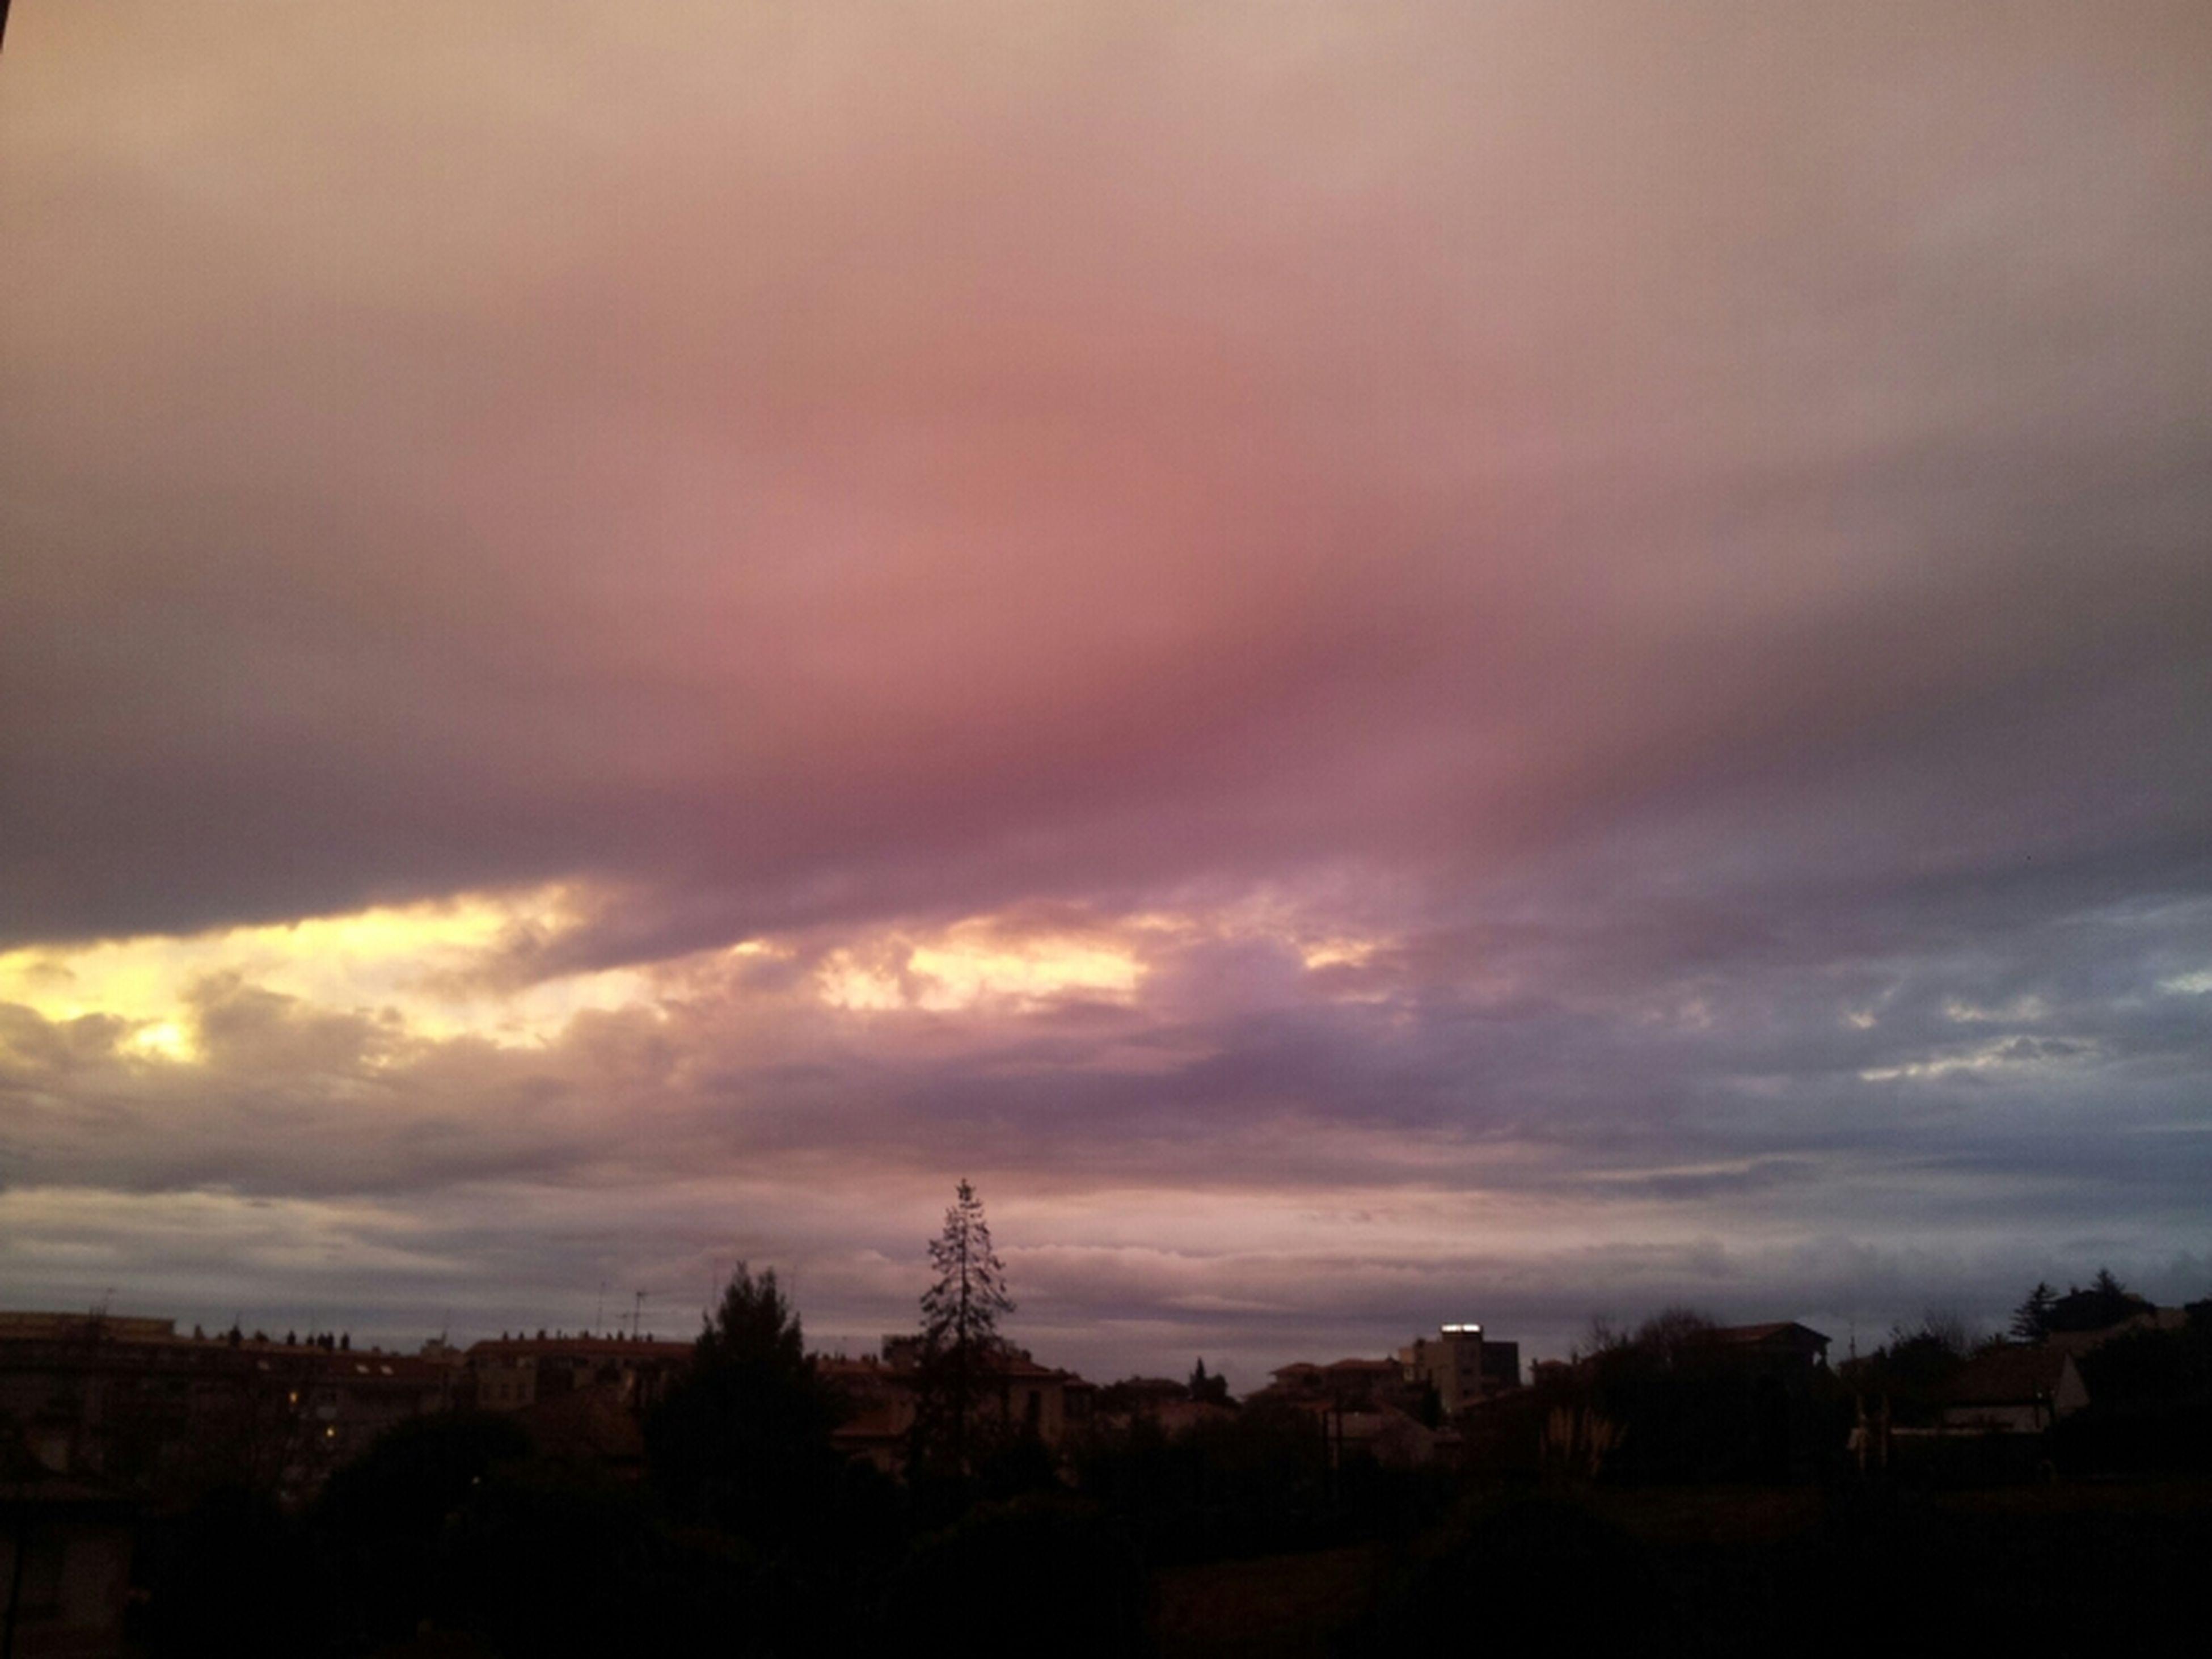 sky, silhouette, cloud - sky, sunset, building exterior, cloudy, built structure, landscape, tree, house, cloud, architecture, dusk, beauty in nature, scenics, nature, electricity pylon, power line, tranquil scene, dramatic sky